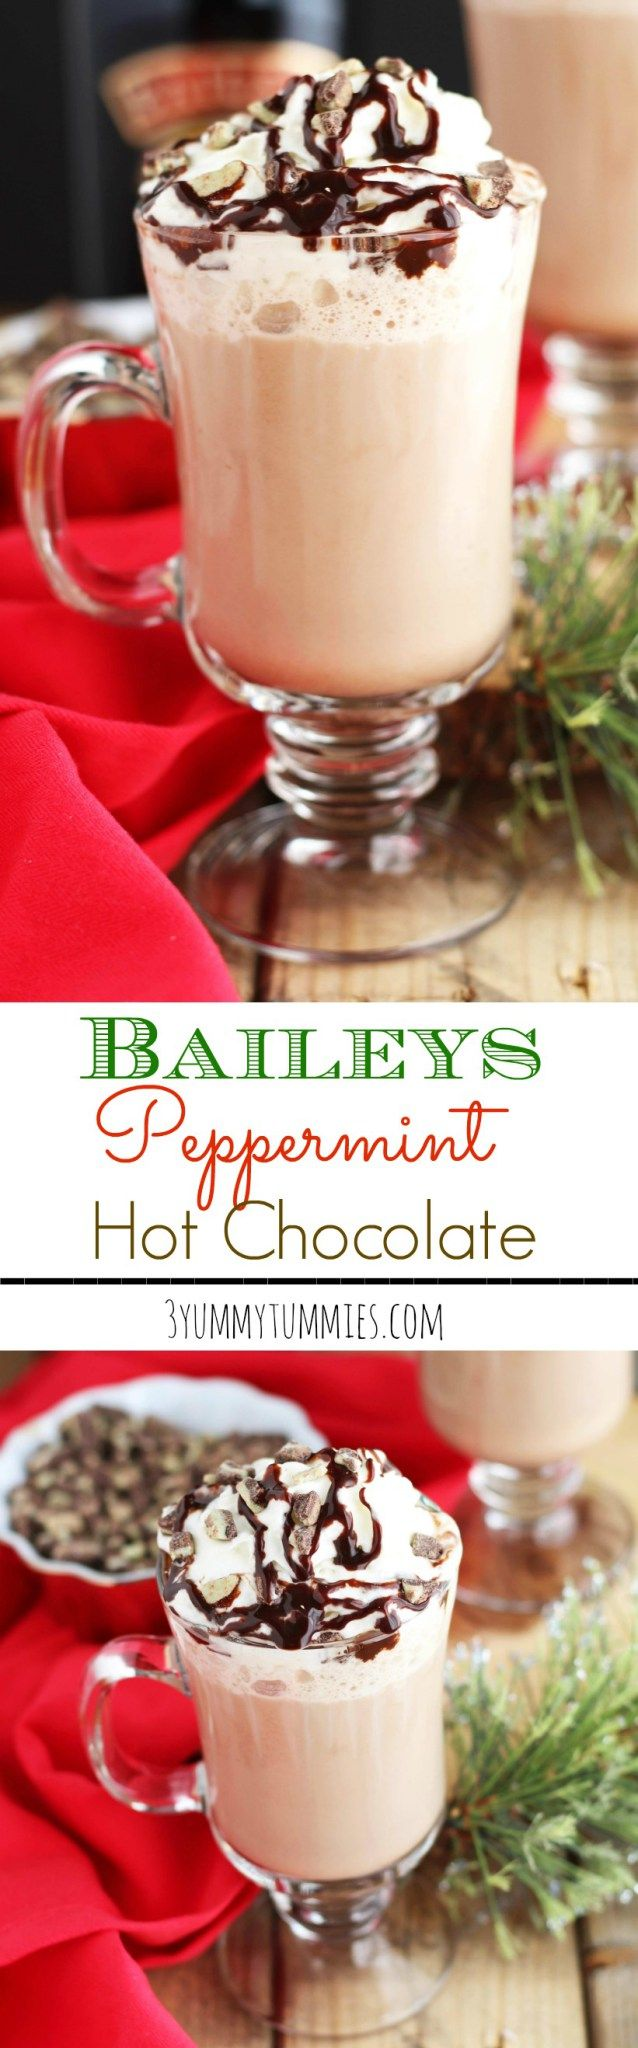 Baileys Peppermint Hot Chocolate   3 Yummy Tummies